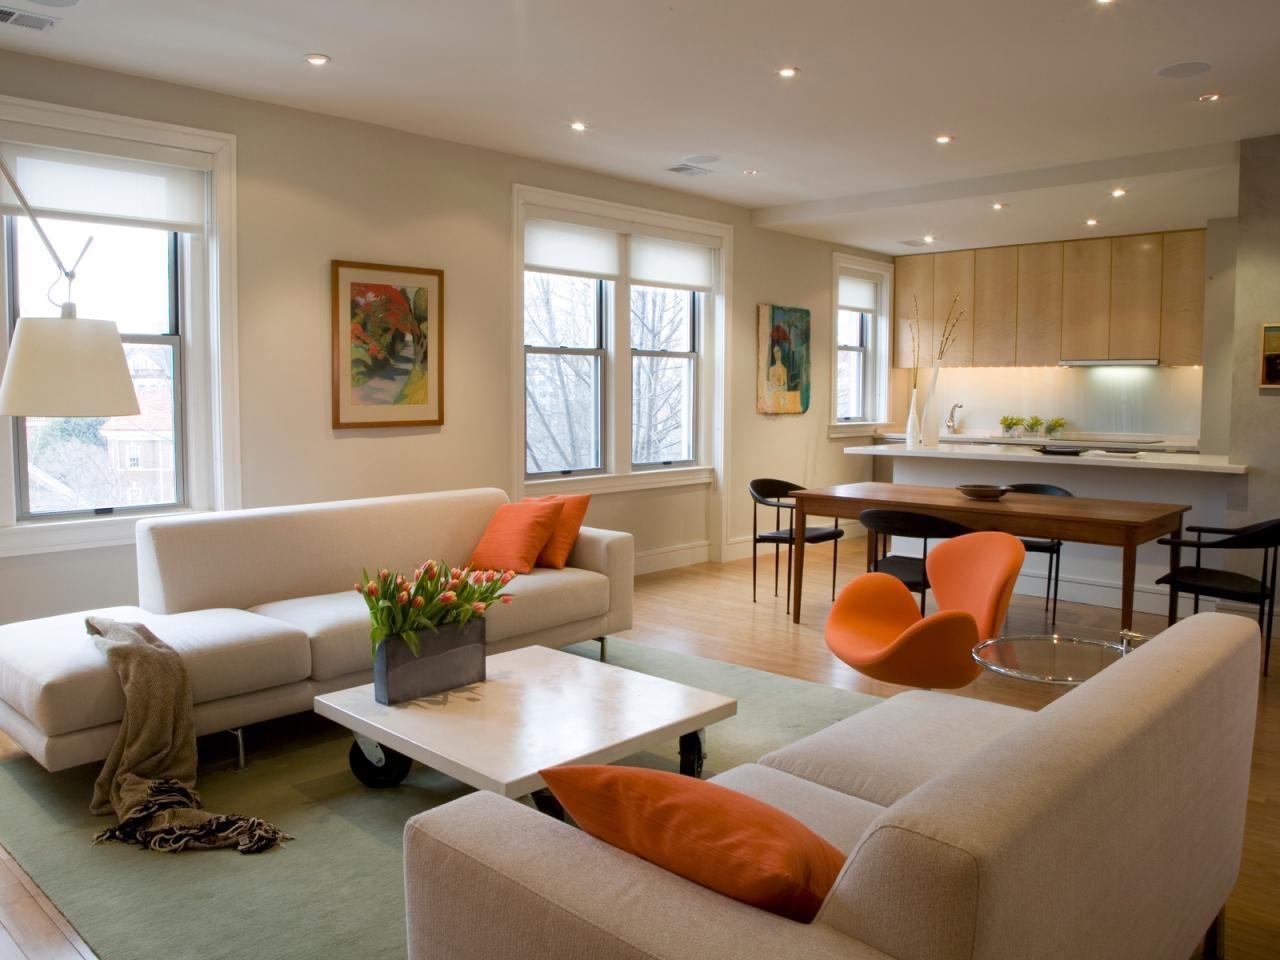 Hgtv Designs For Living Room Glamorous 7 Furniture Arrangement Tips  Vanishing Point Hgtv And Room Decorating Inspiration